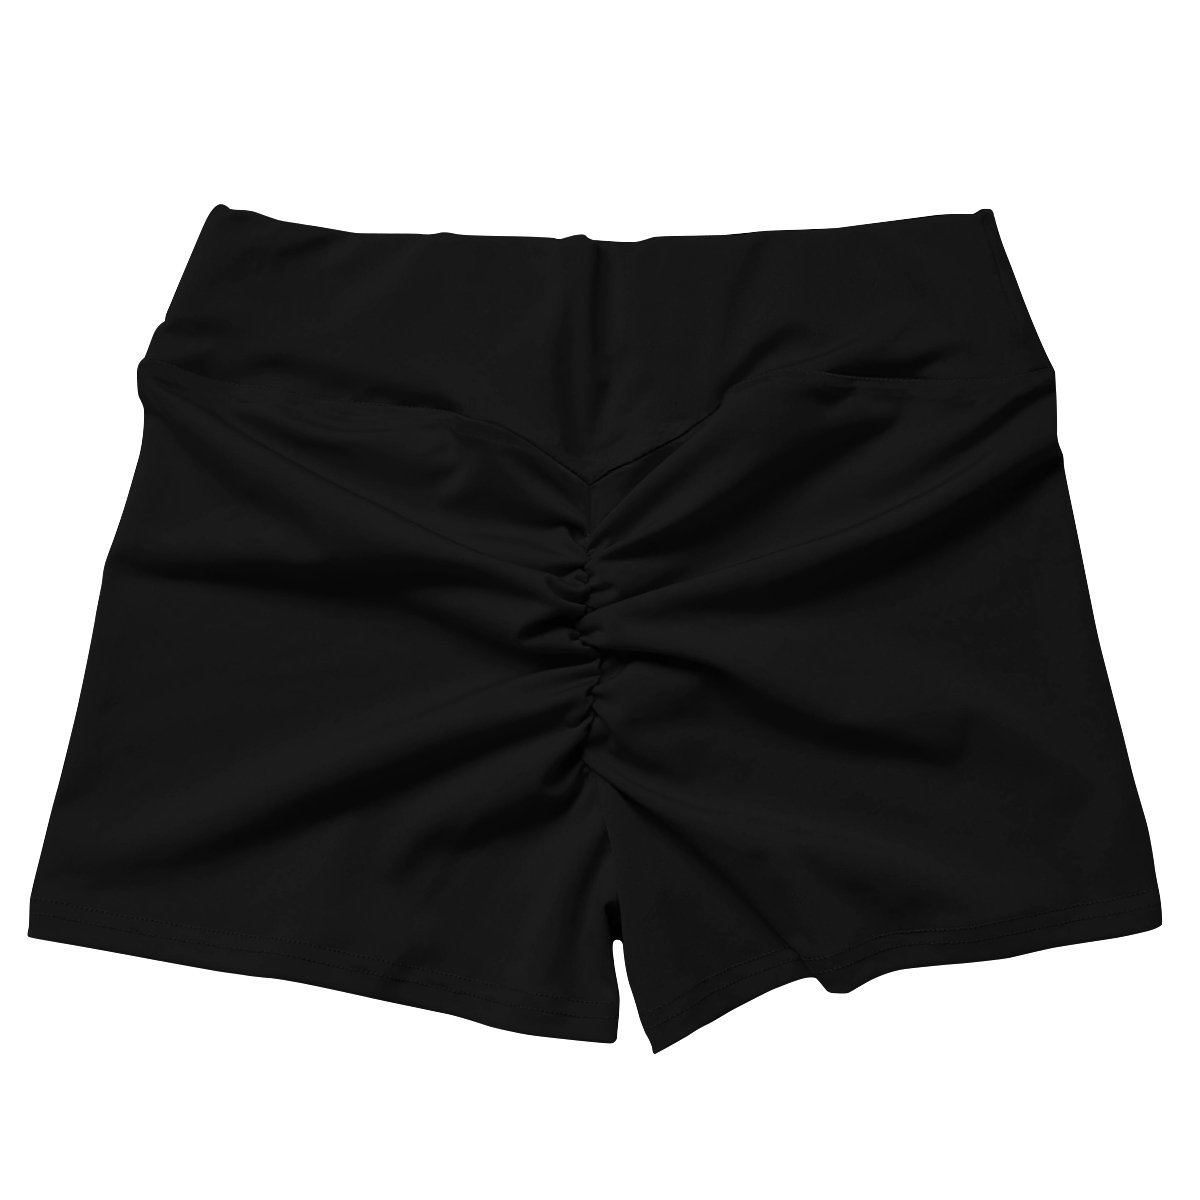 alphonse summer active wear set 204966 - Anime Swimsuits